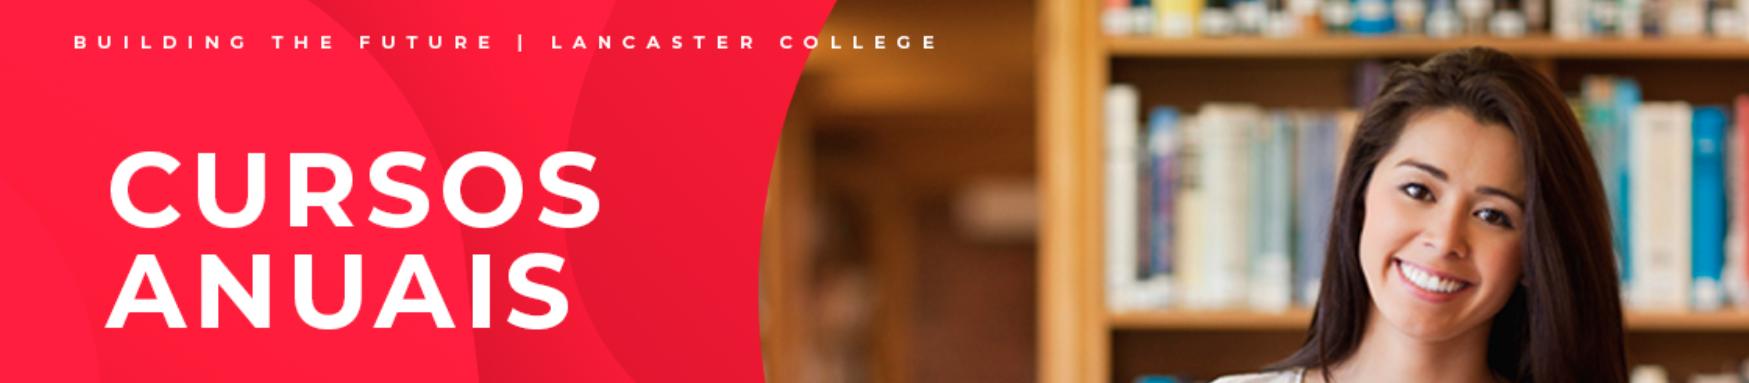 Lancaster College Vila Nova de Gaia